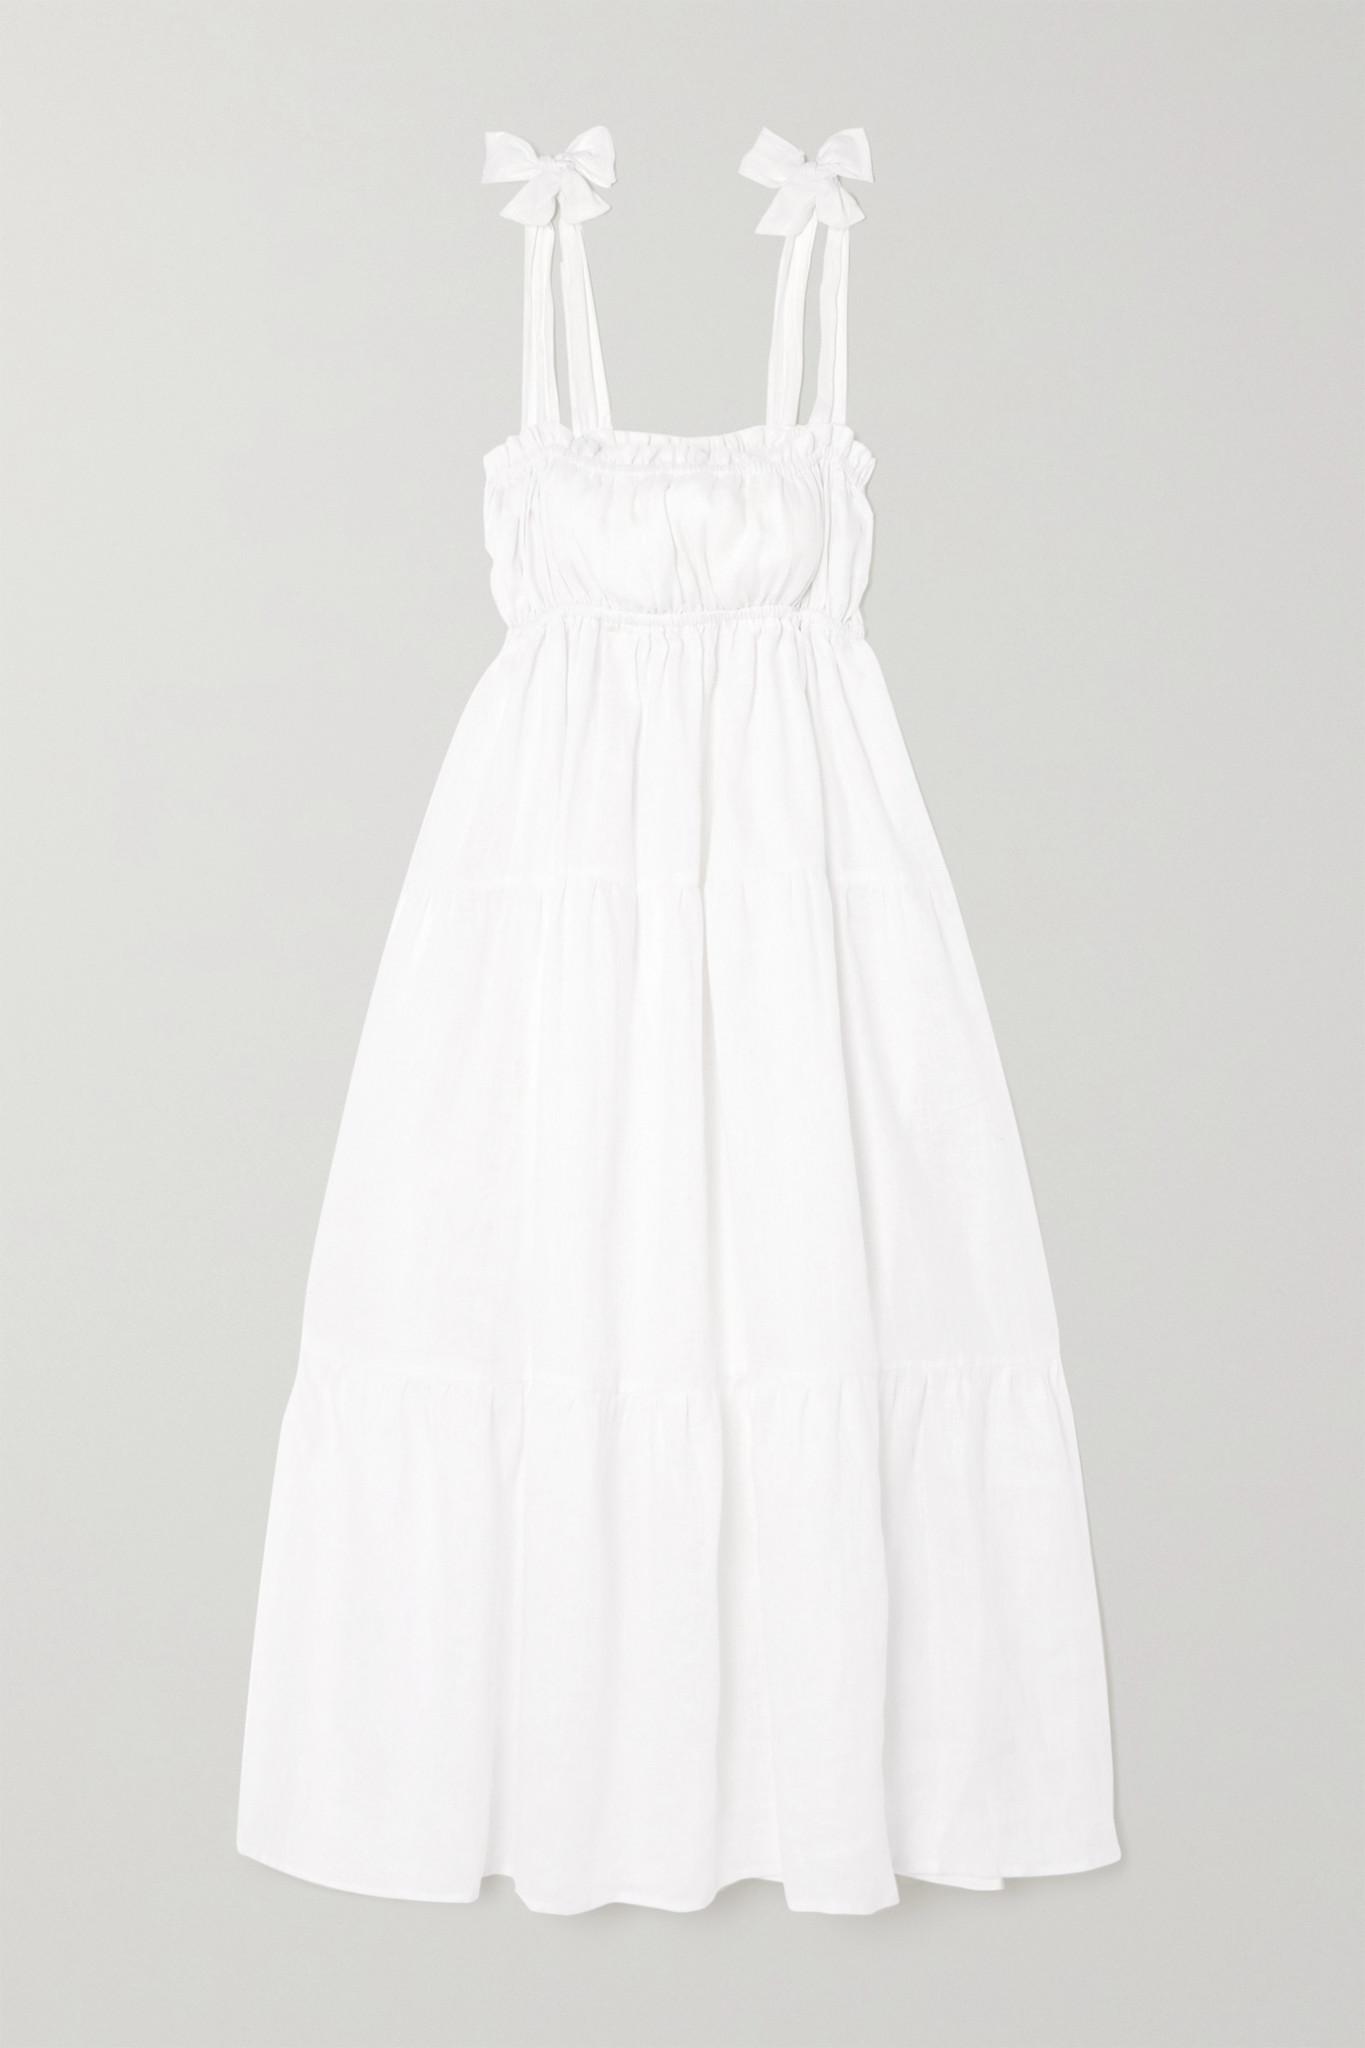 FAITHFULL THE BRAND - + Net Sustain Bellamy Tie-detailed Tiered Linen Midi Dress - White - small